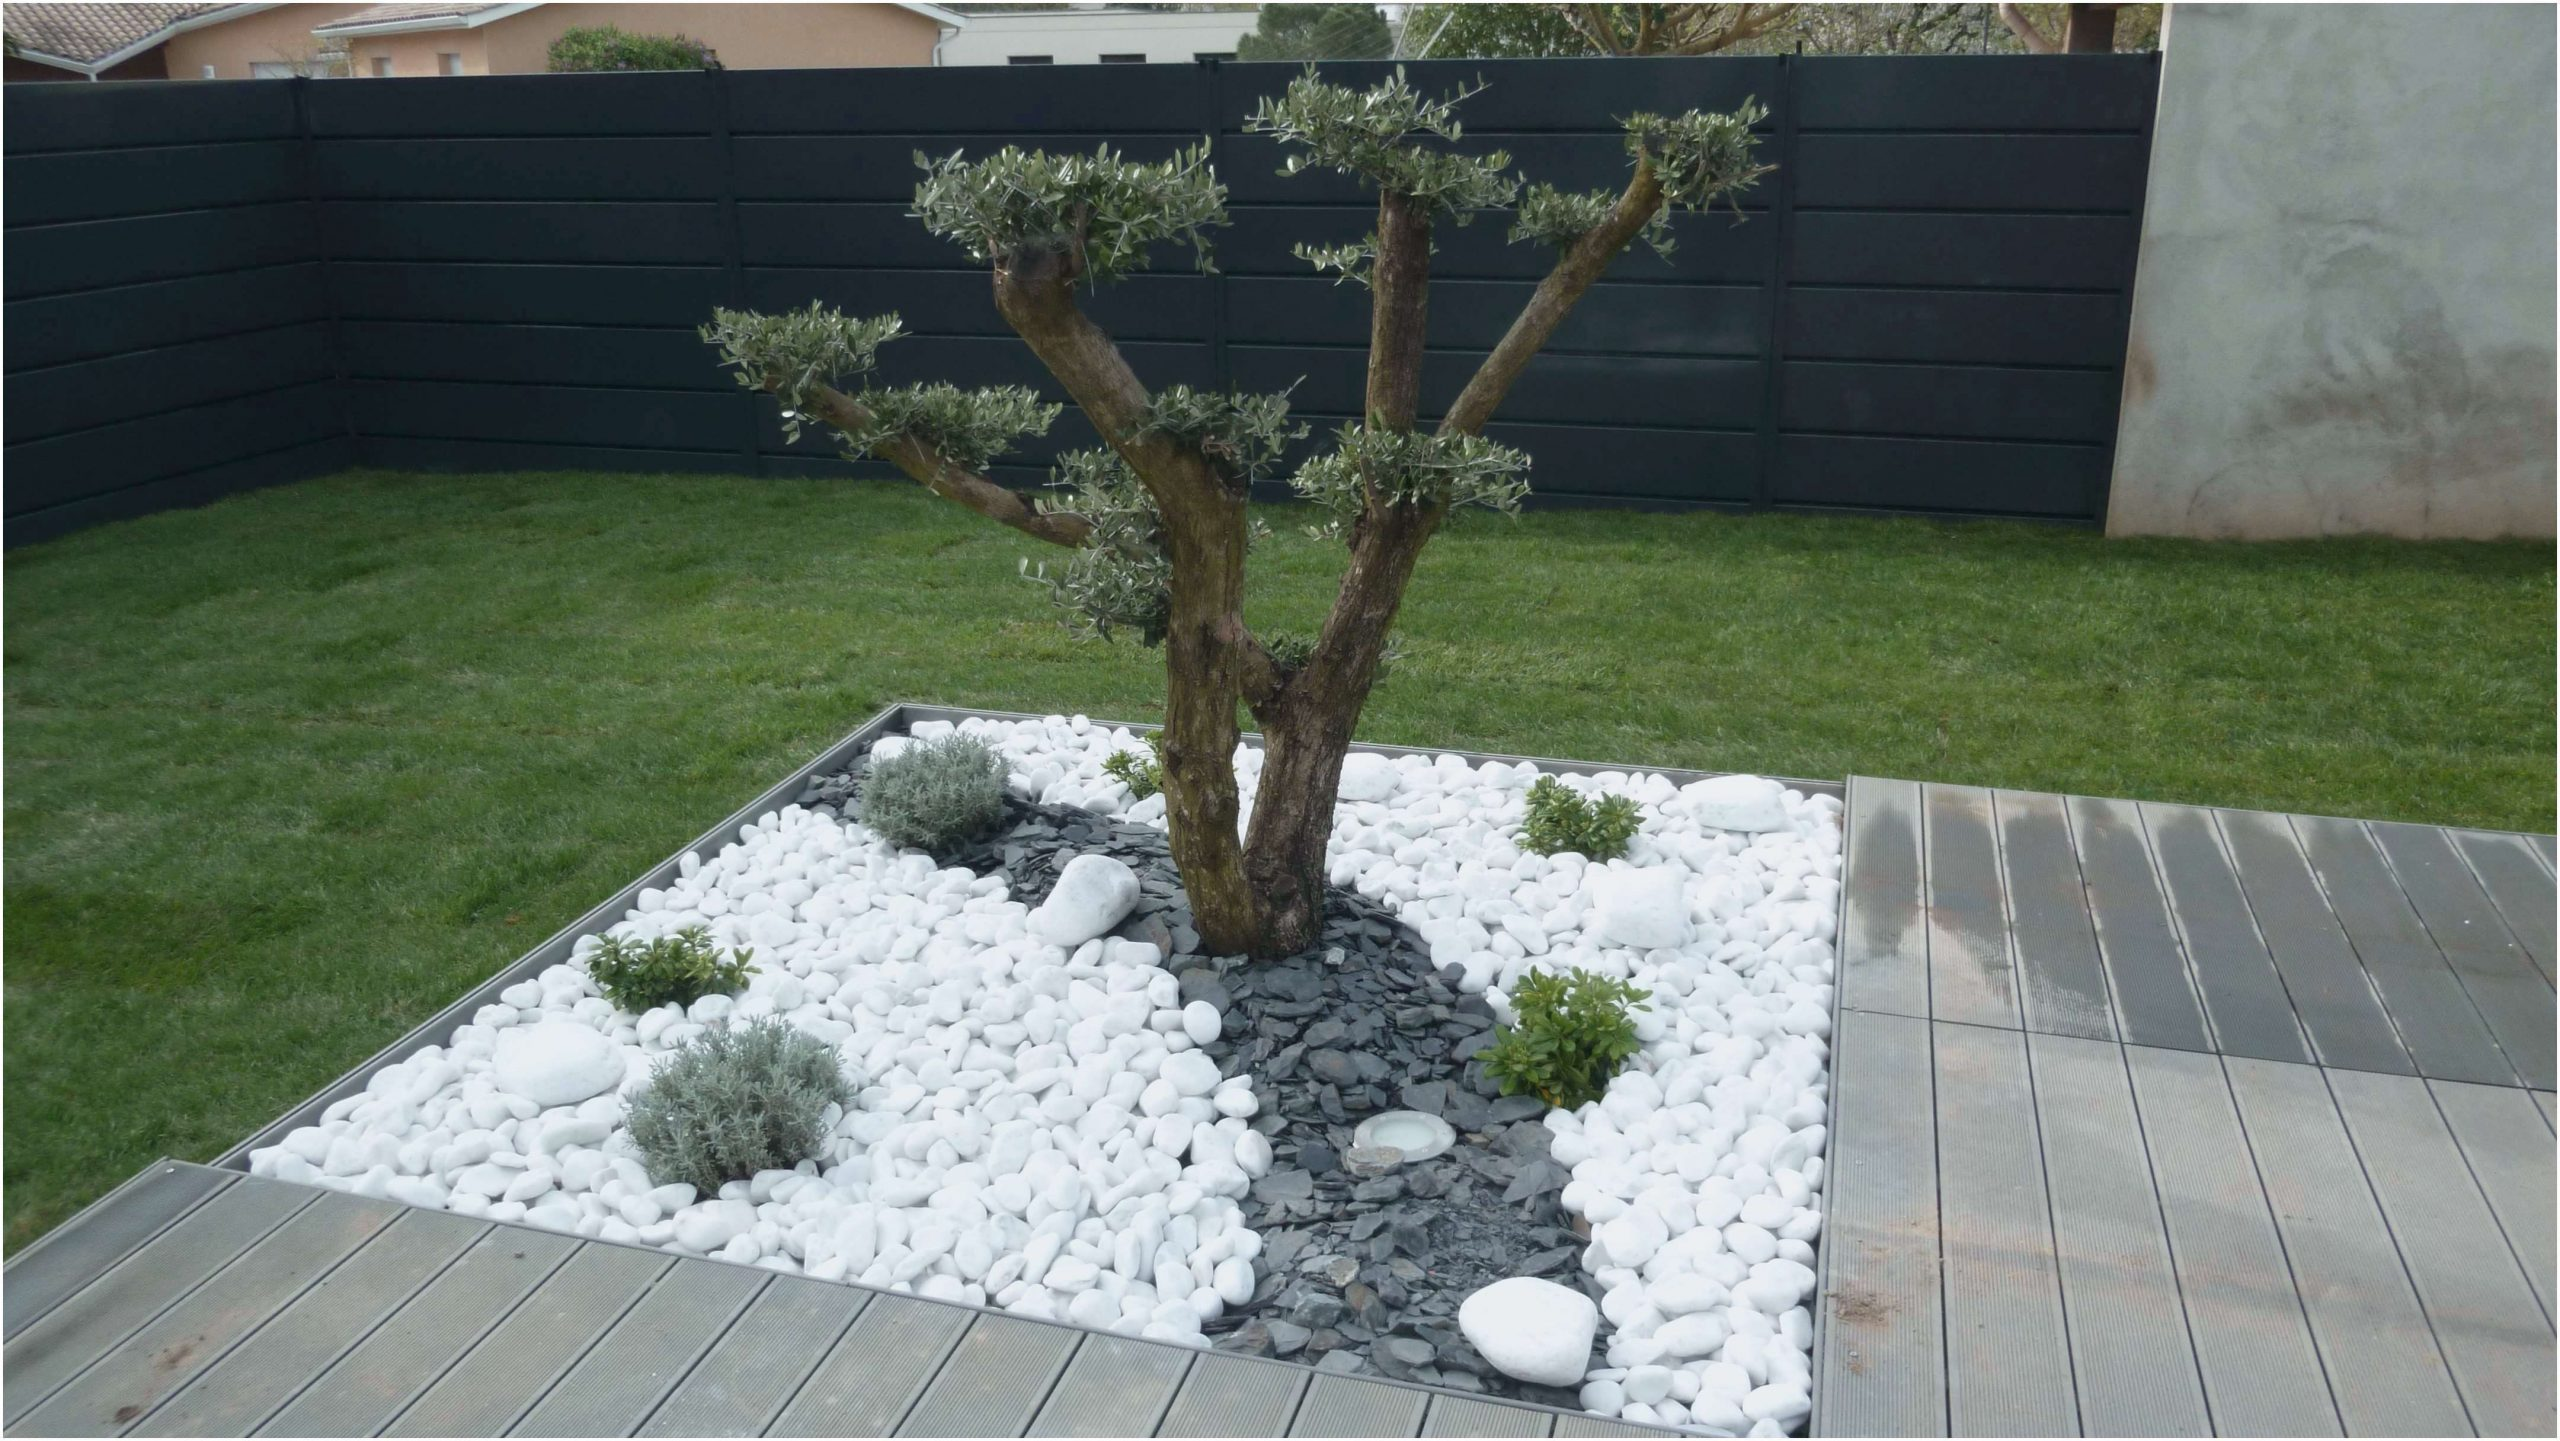 Idee Deco Jardin Avec Gravillon | Idee Deco Jardin ... avec Jardin Avec Galets Blancs